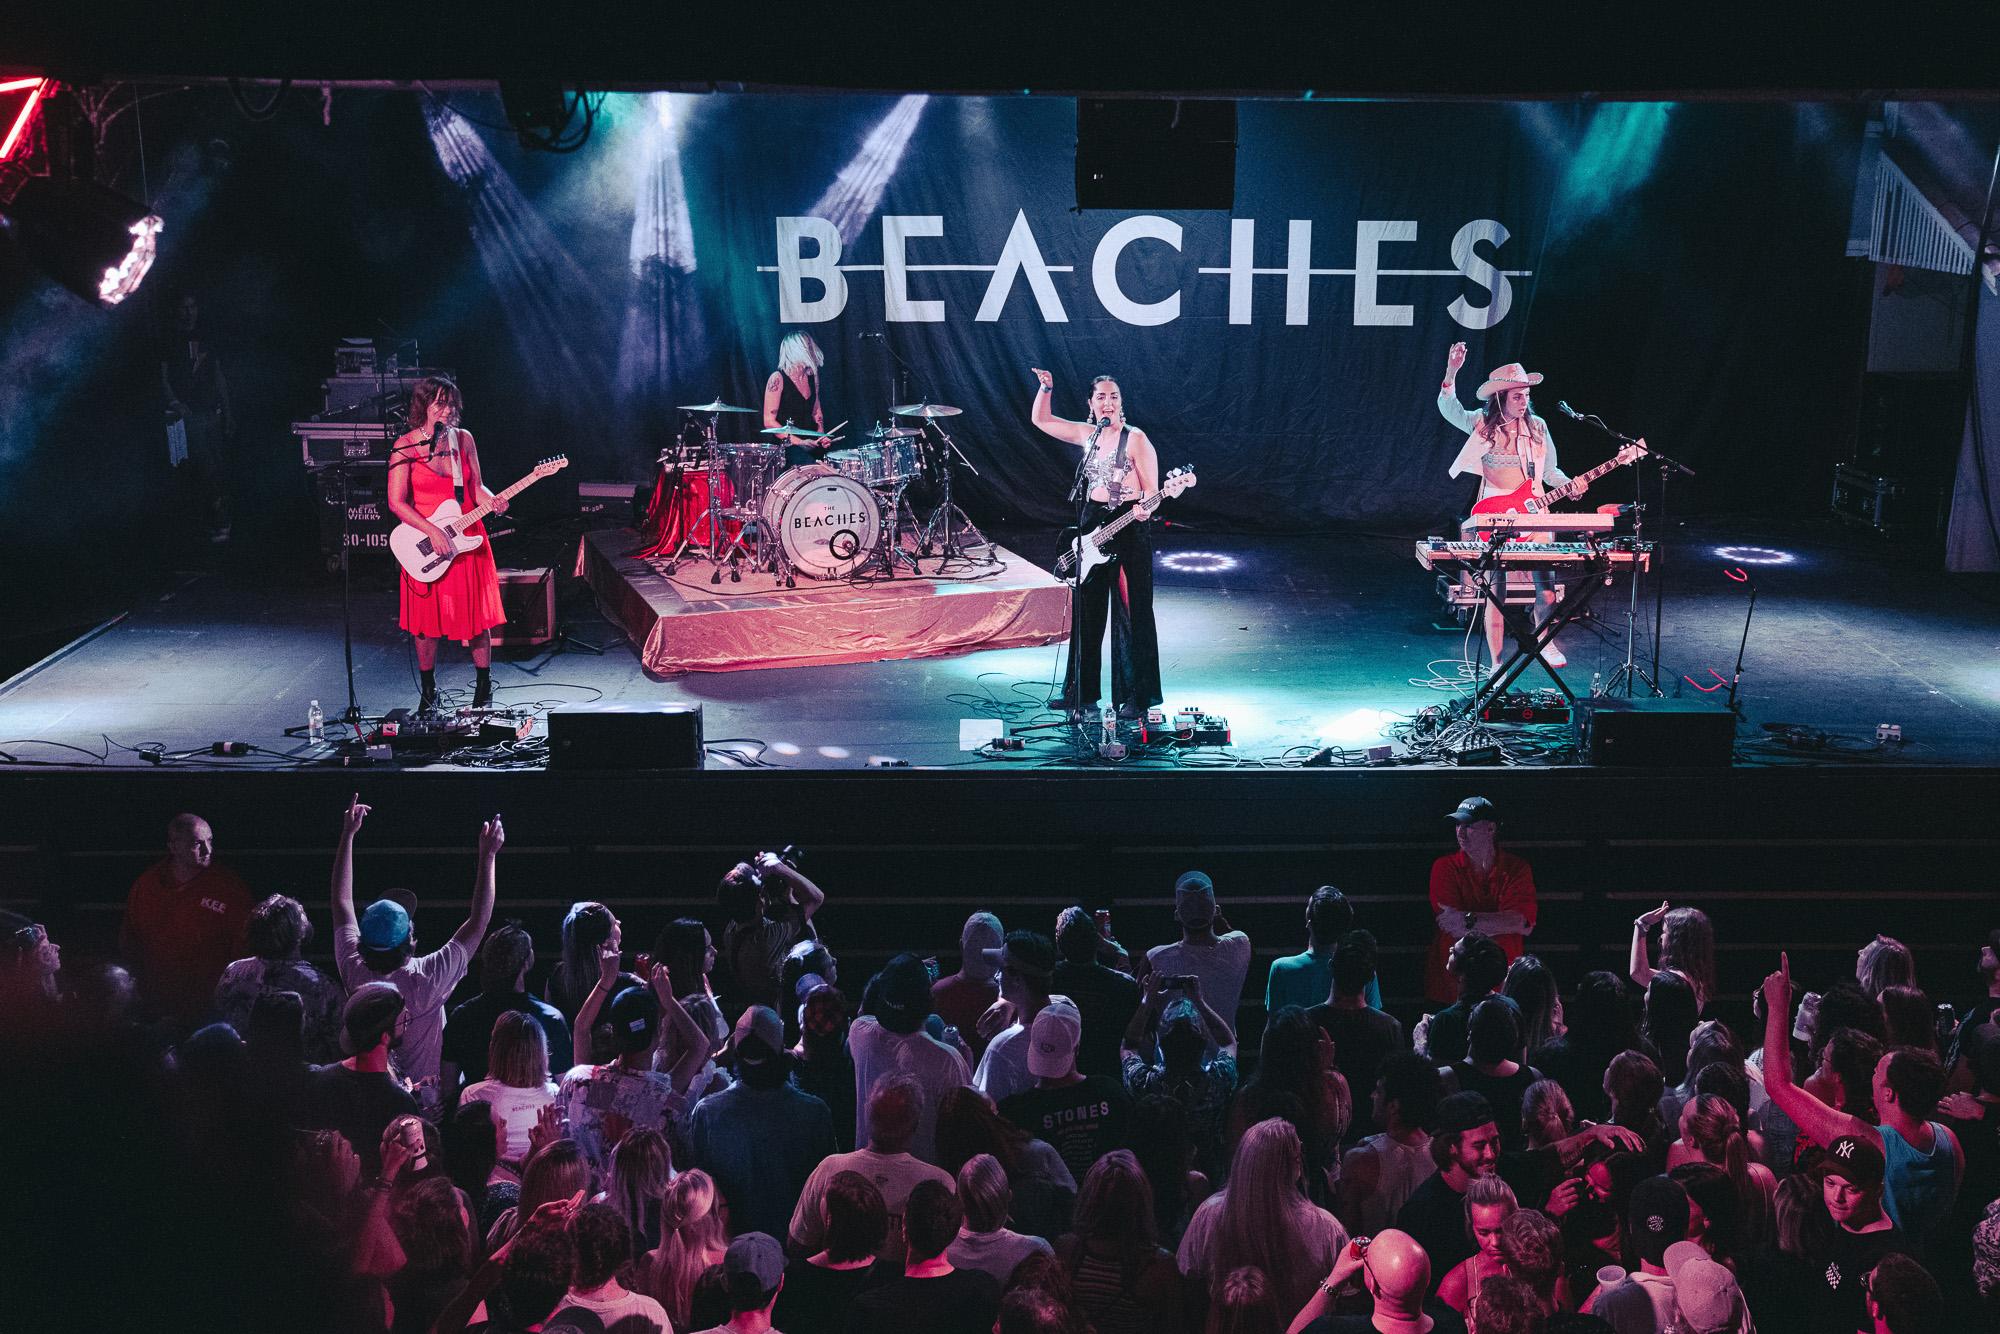 The_Beaches_Bala_4.jpg